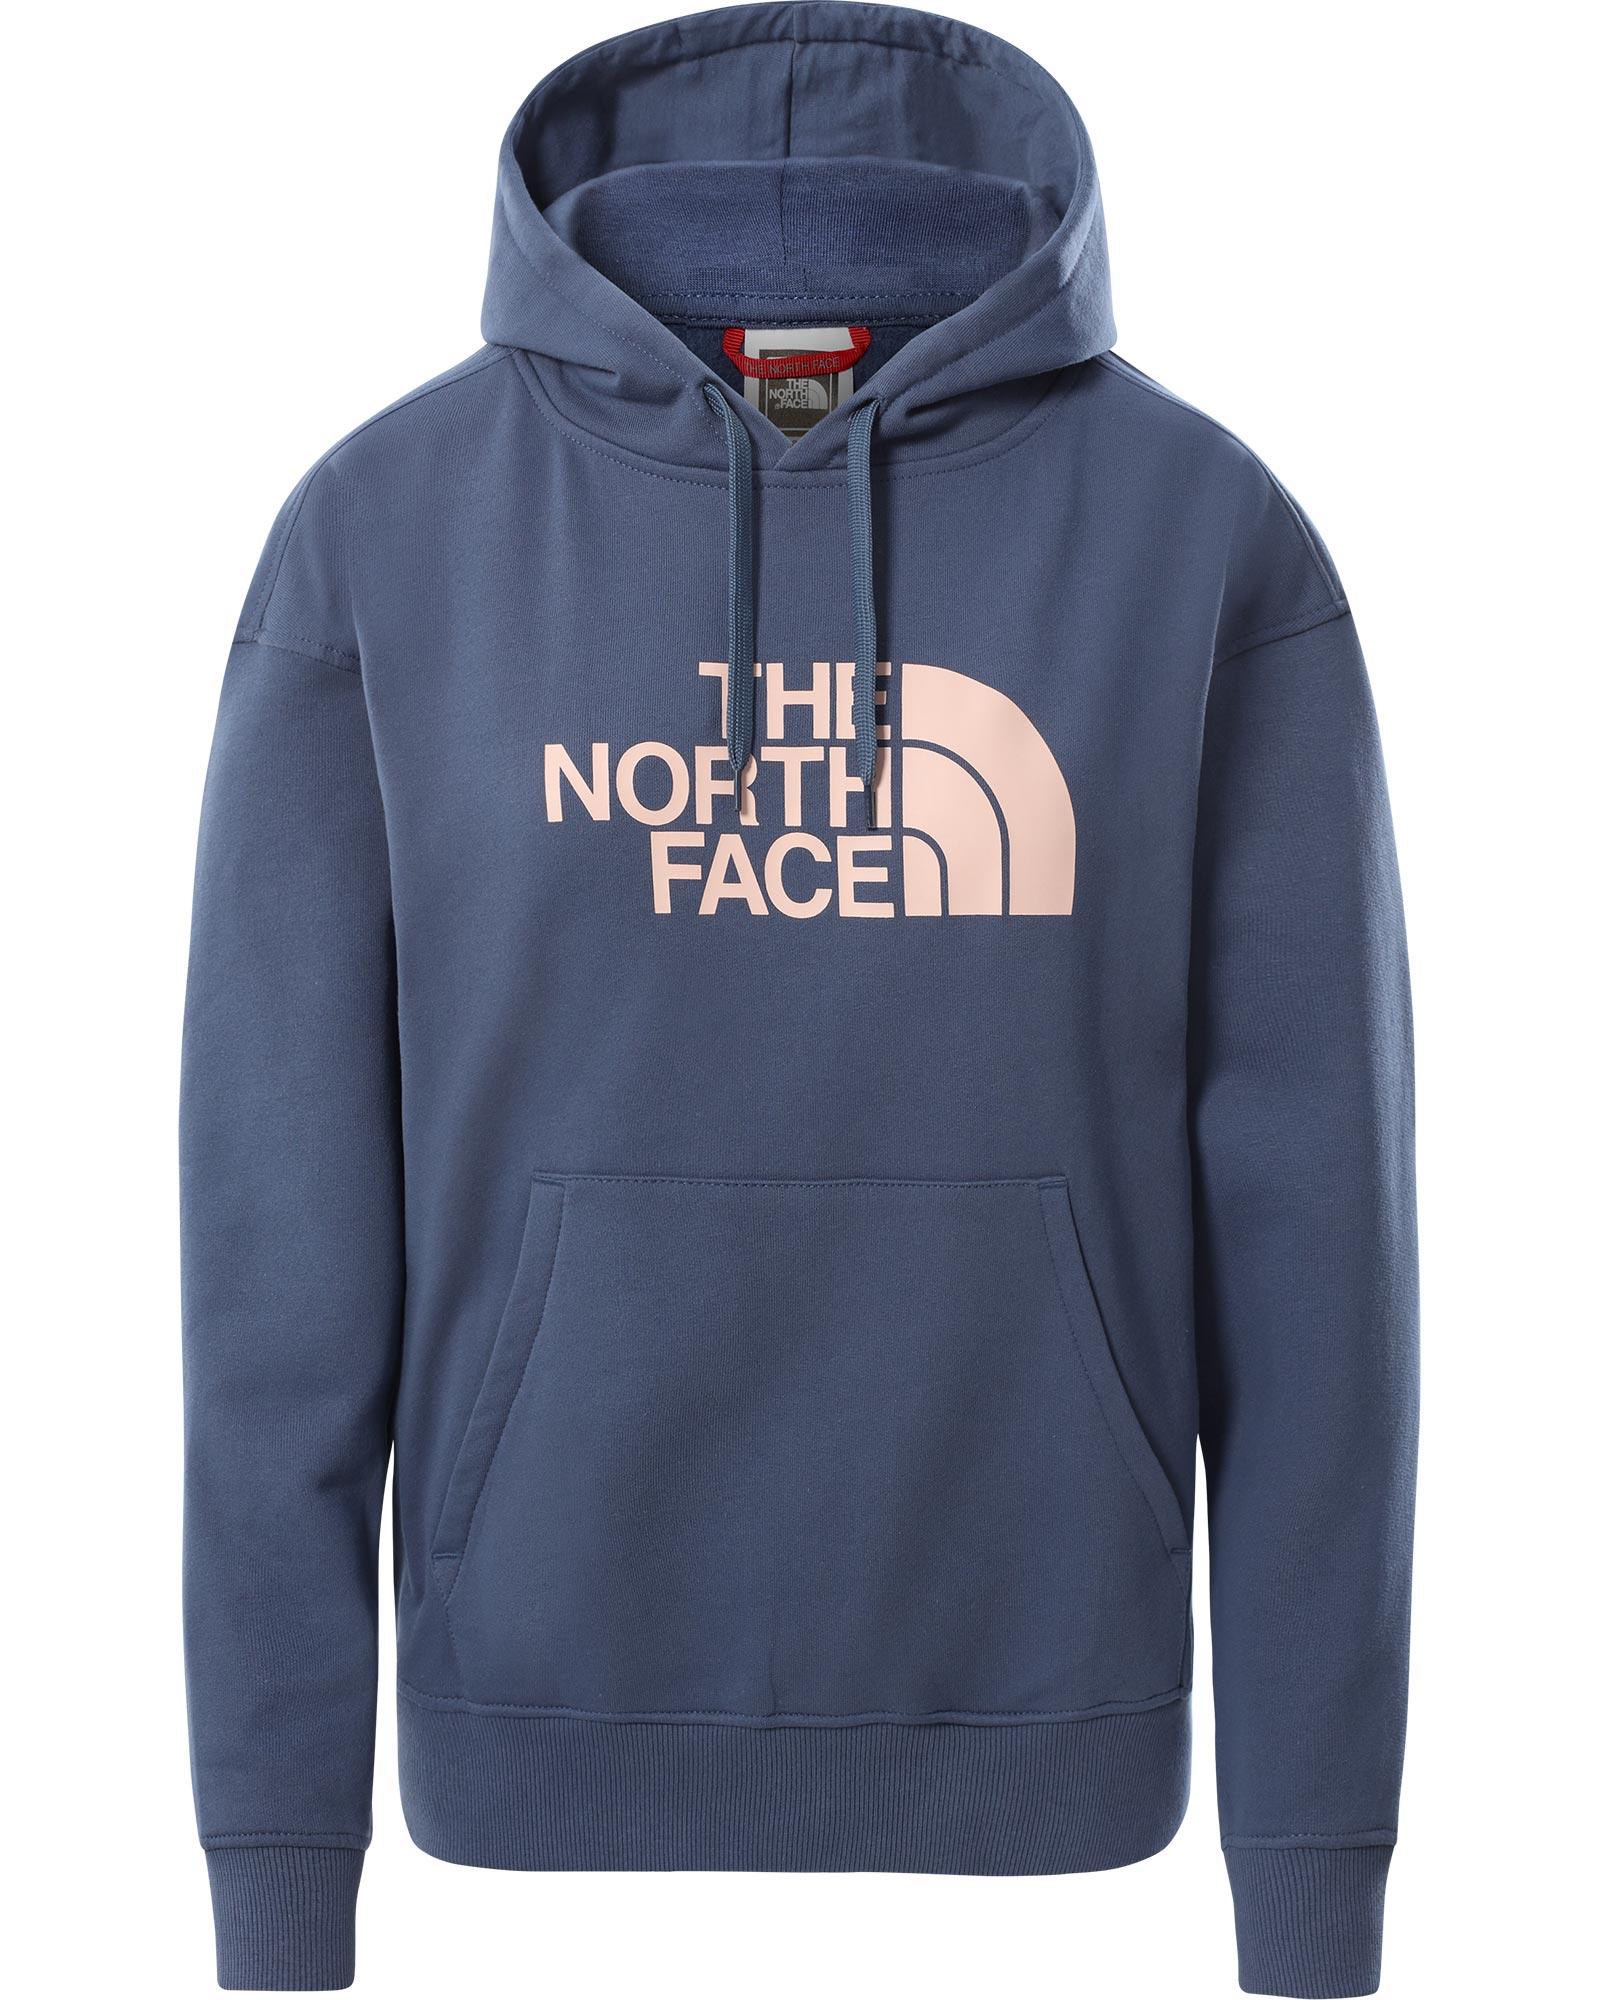 The North Face Women's Light Drew Peak Hoodie 0